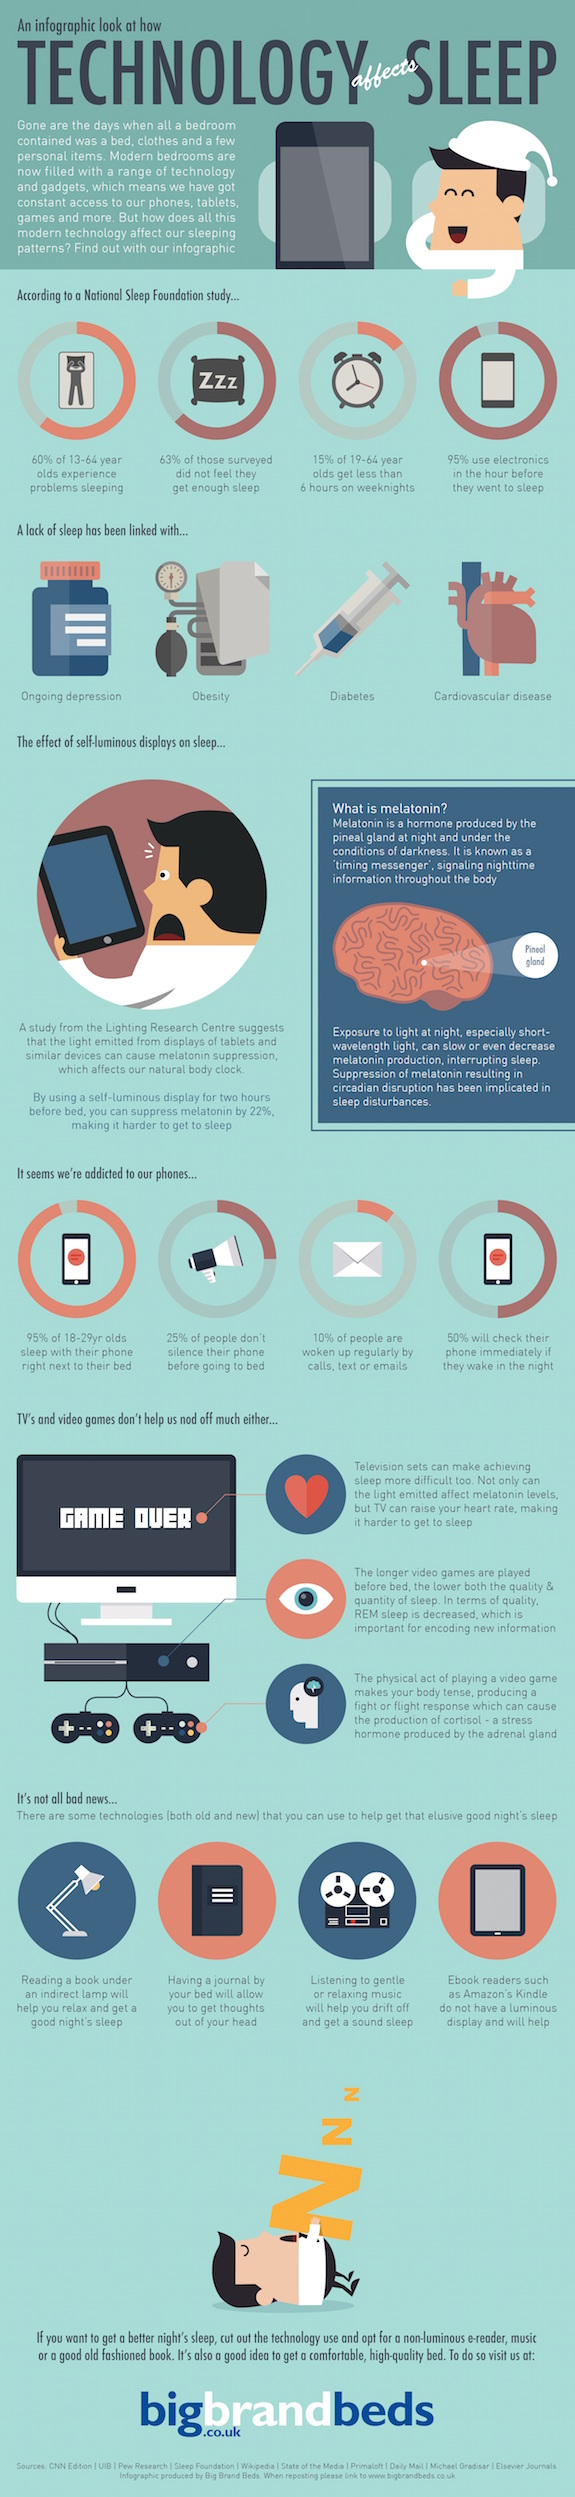 Smartphones, Schlaf, Schlafmangel